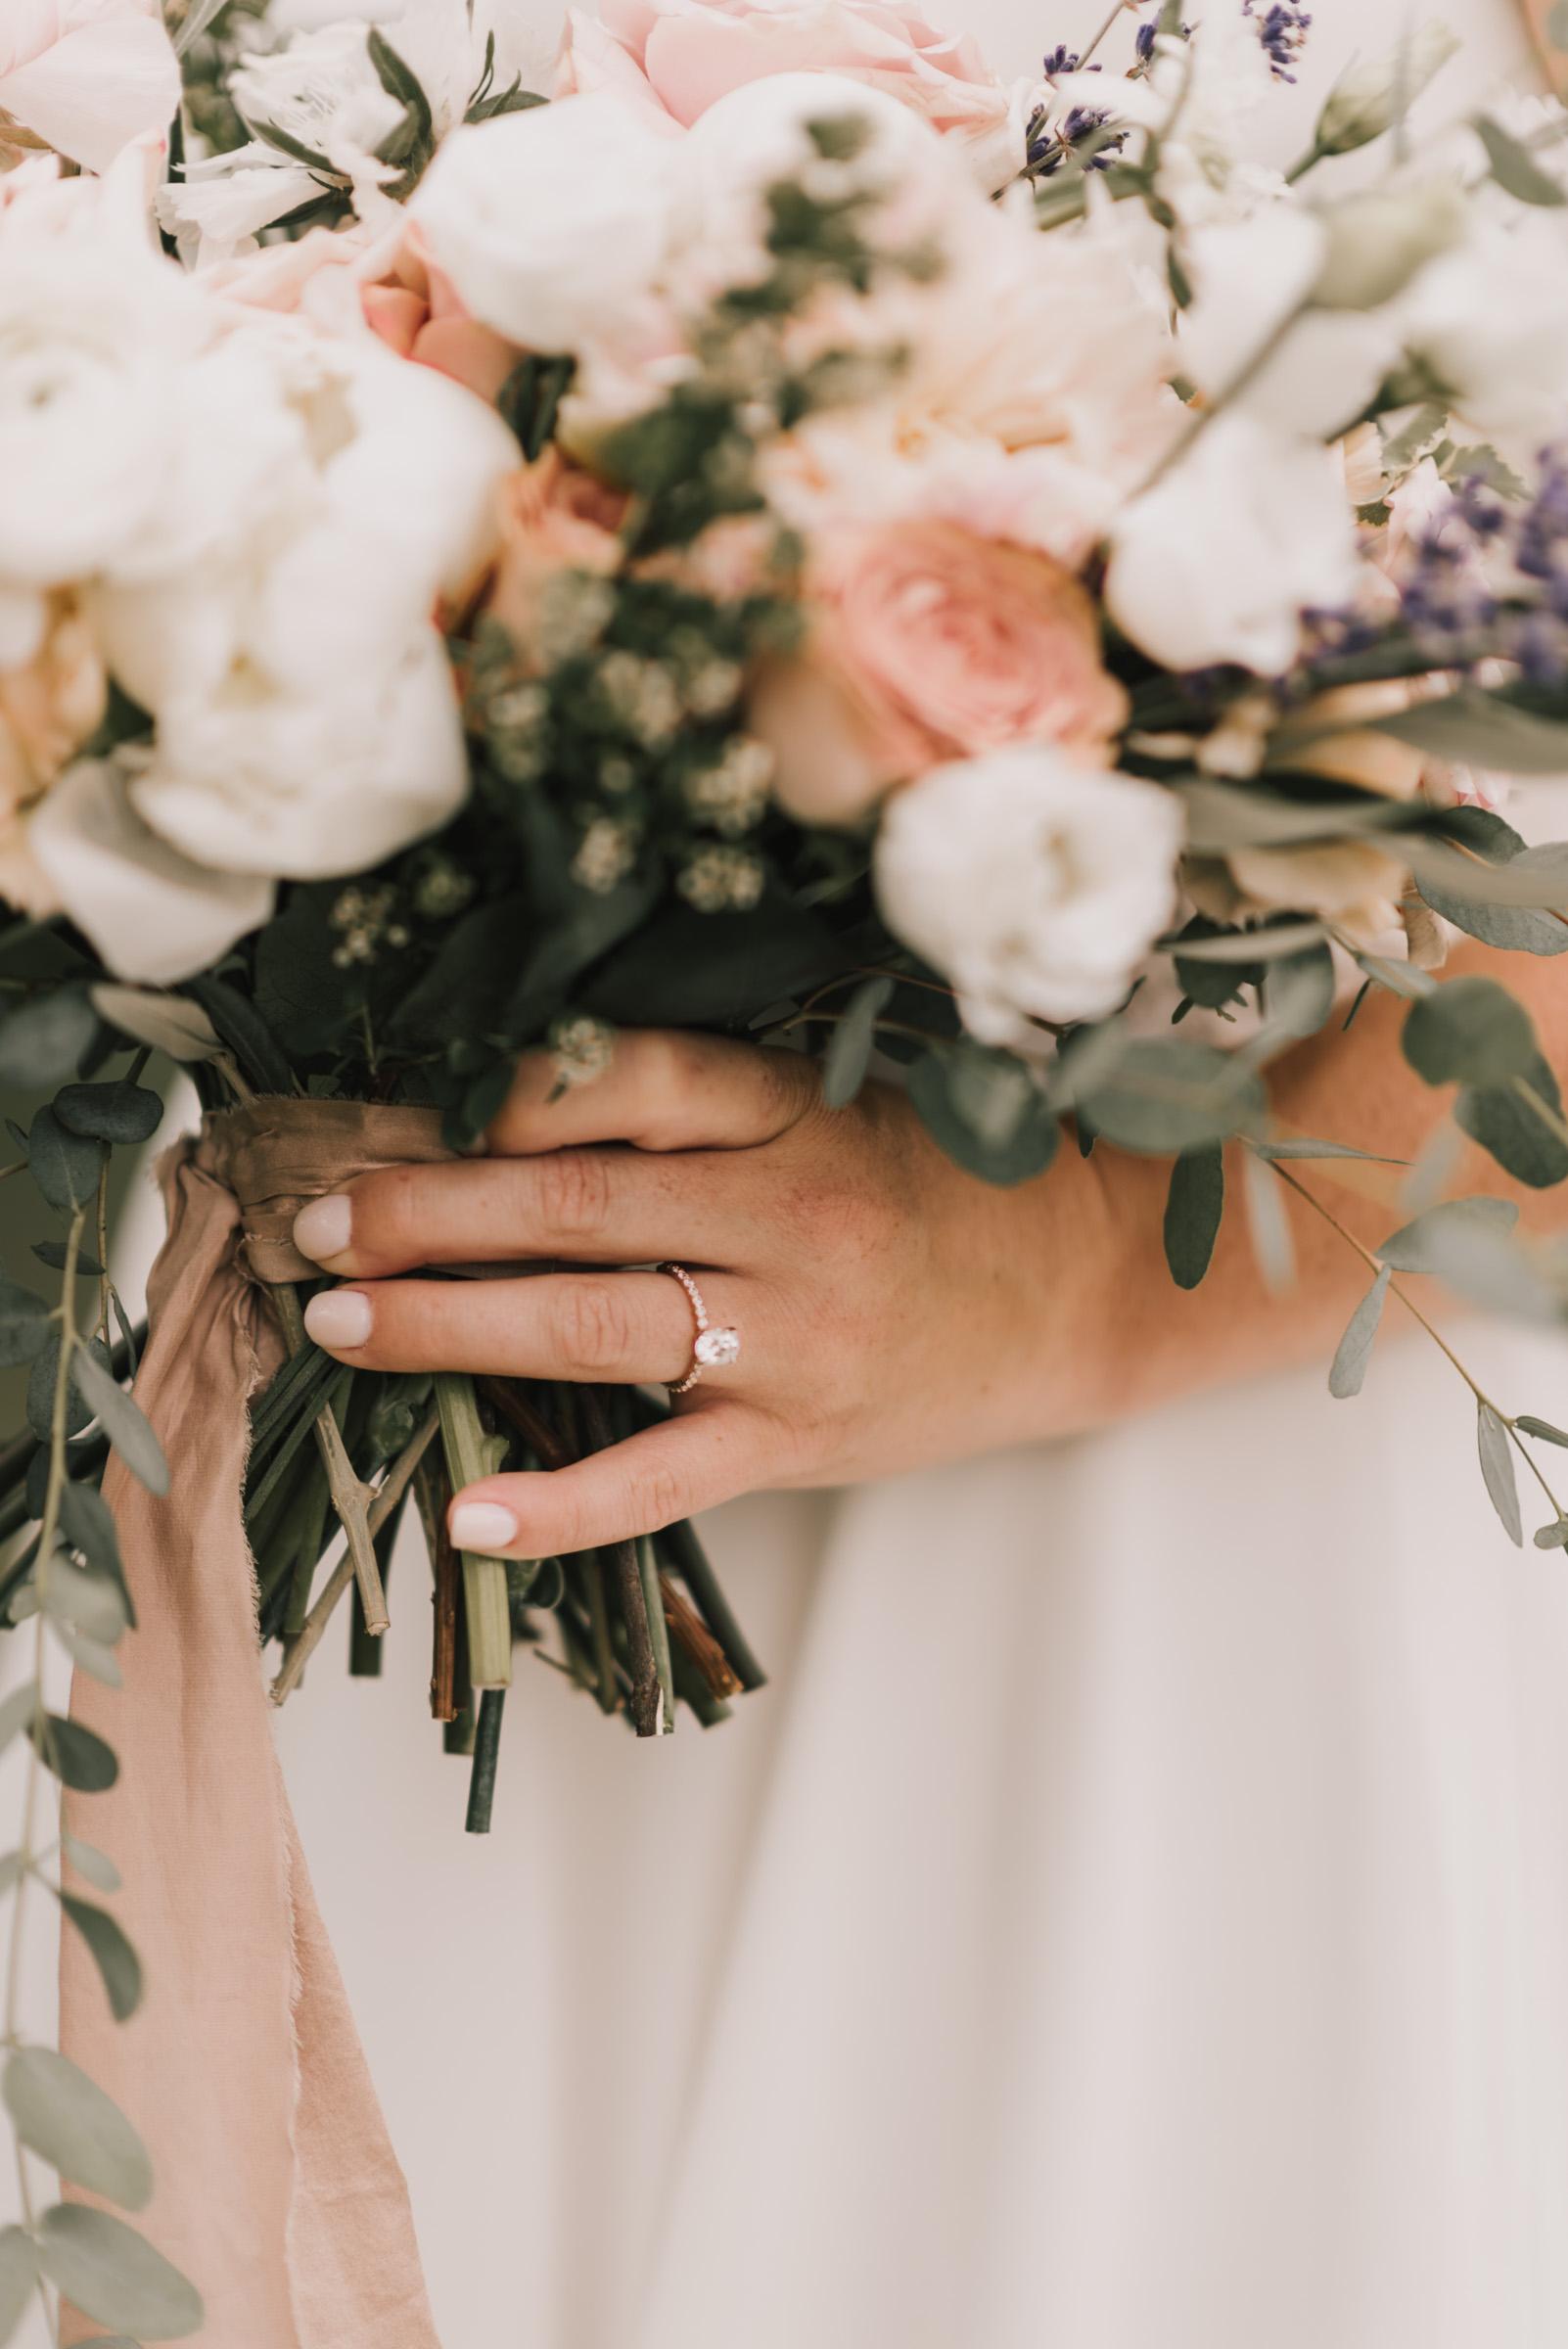 alyssa barletter photography summer odessa missouri wedding kansas city photographer-43.jpg